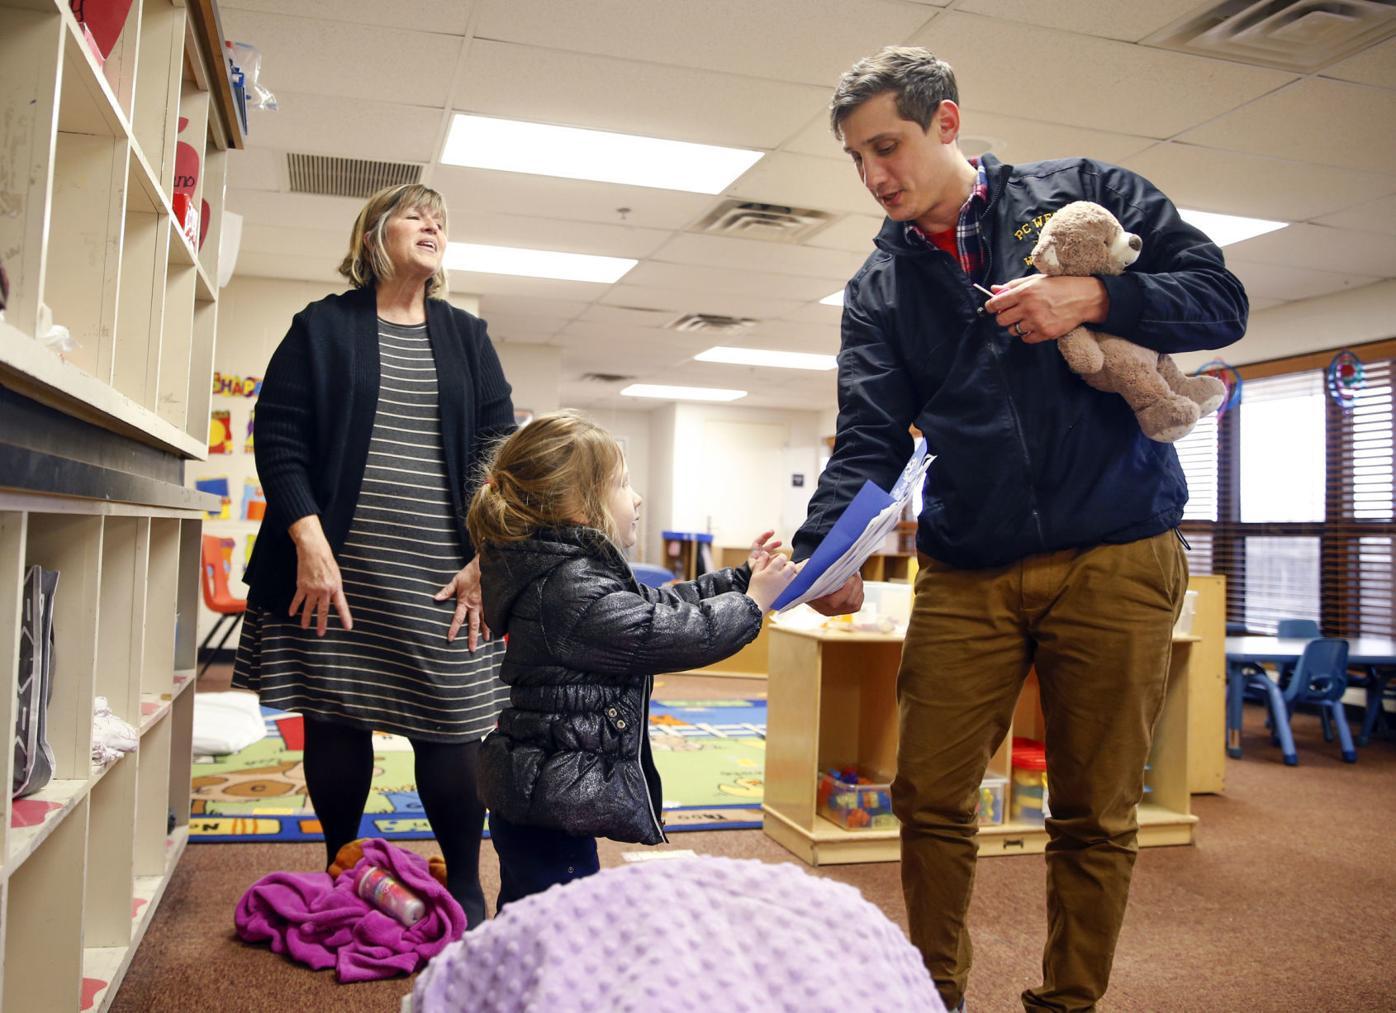 Exchange School District Child Care